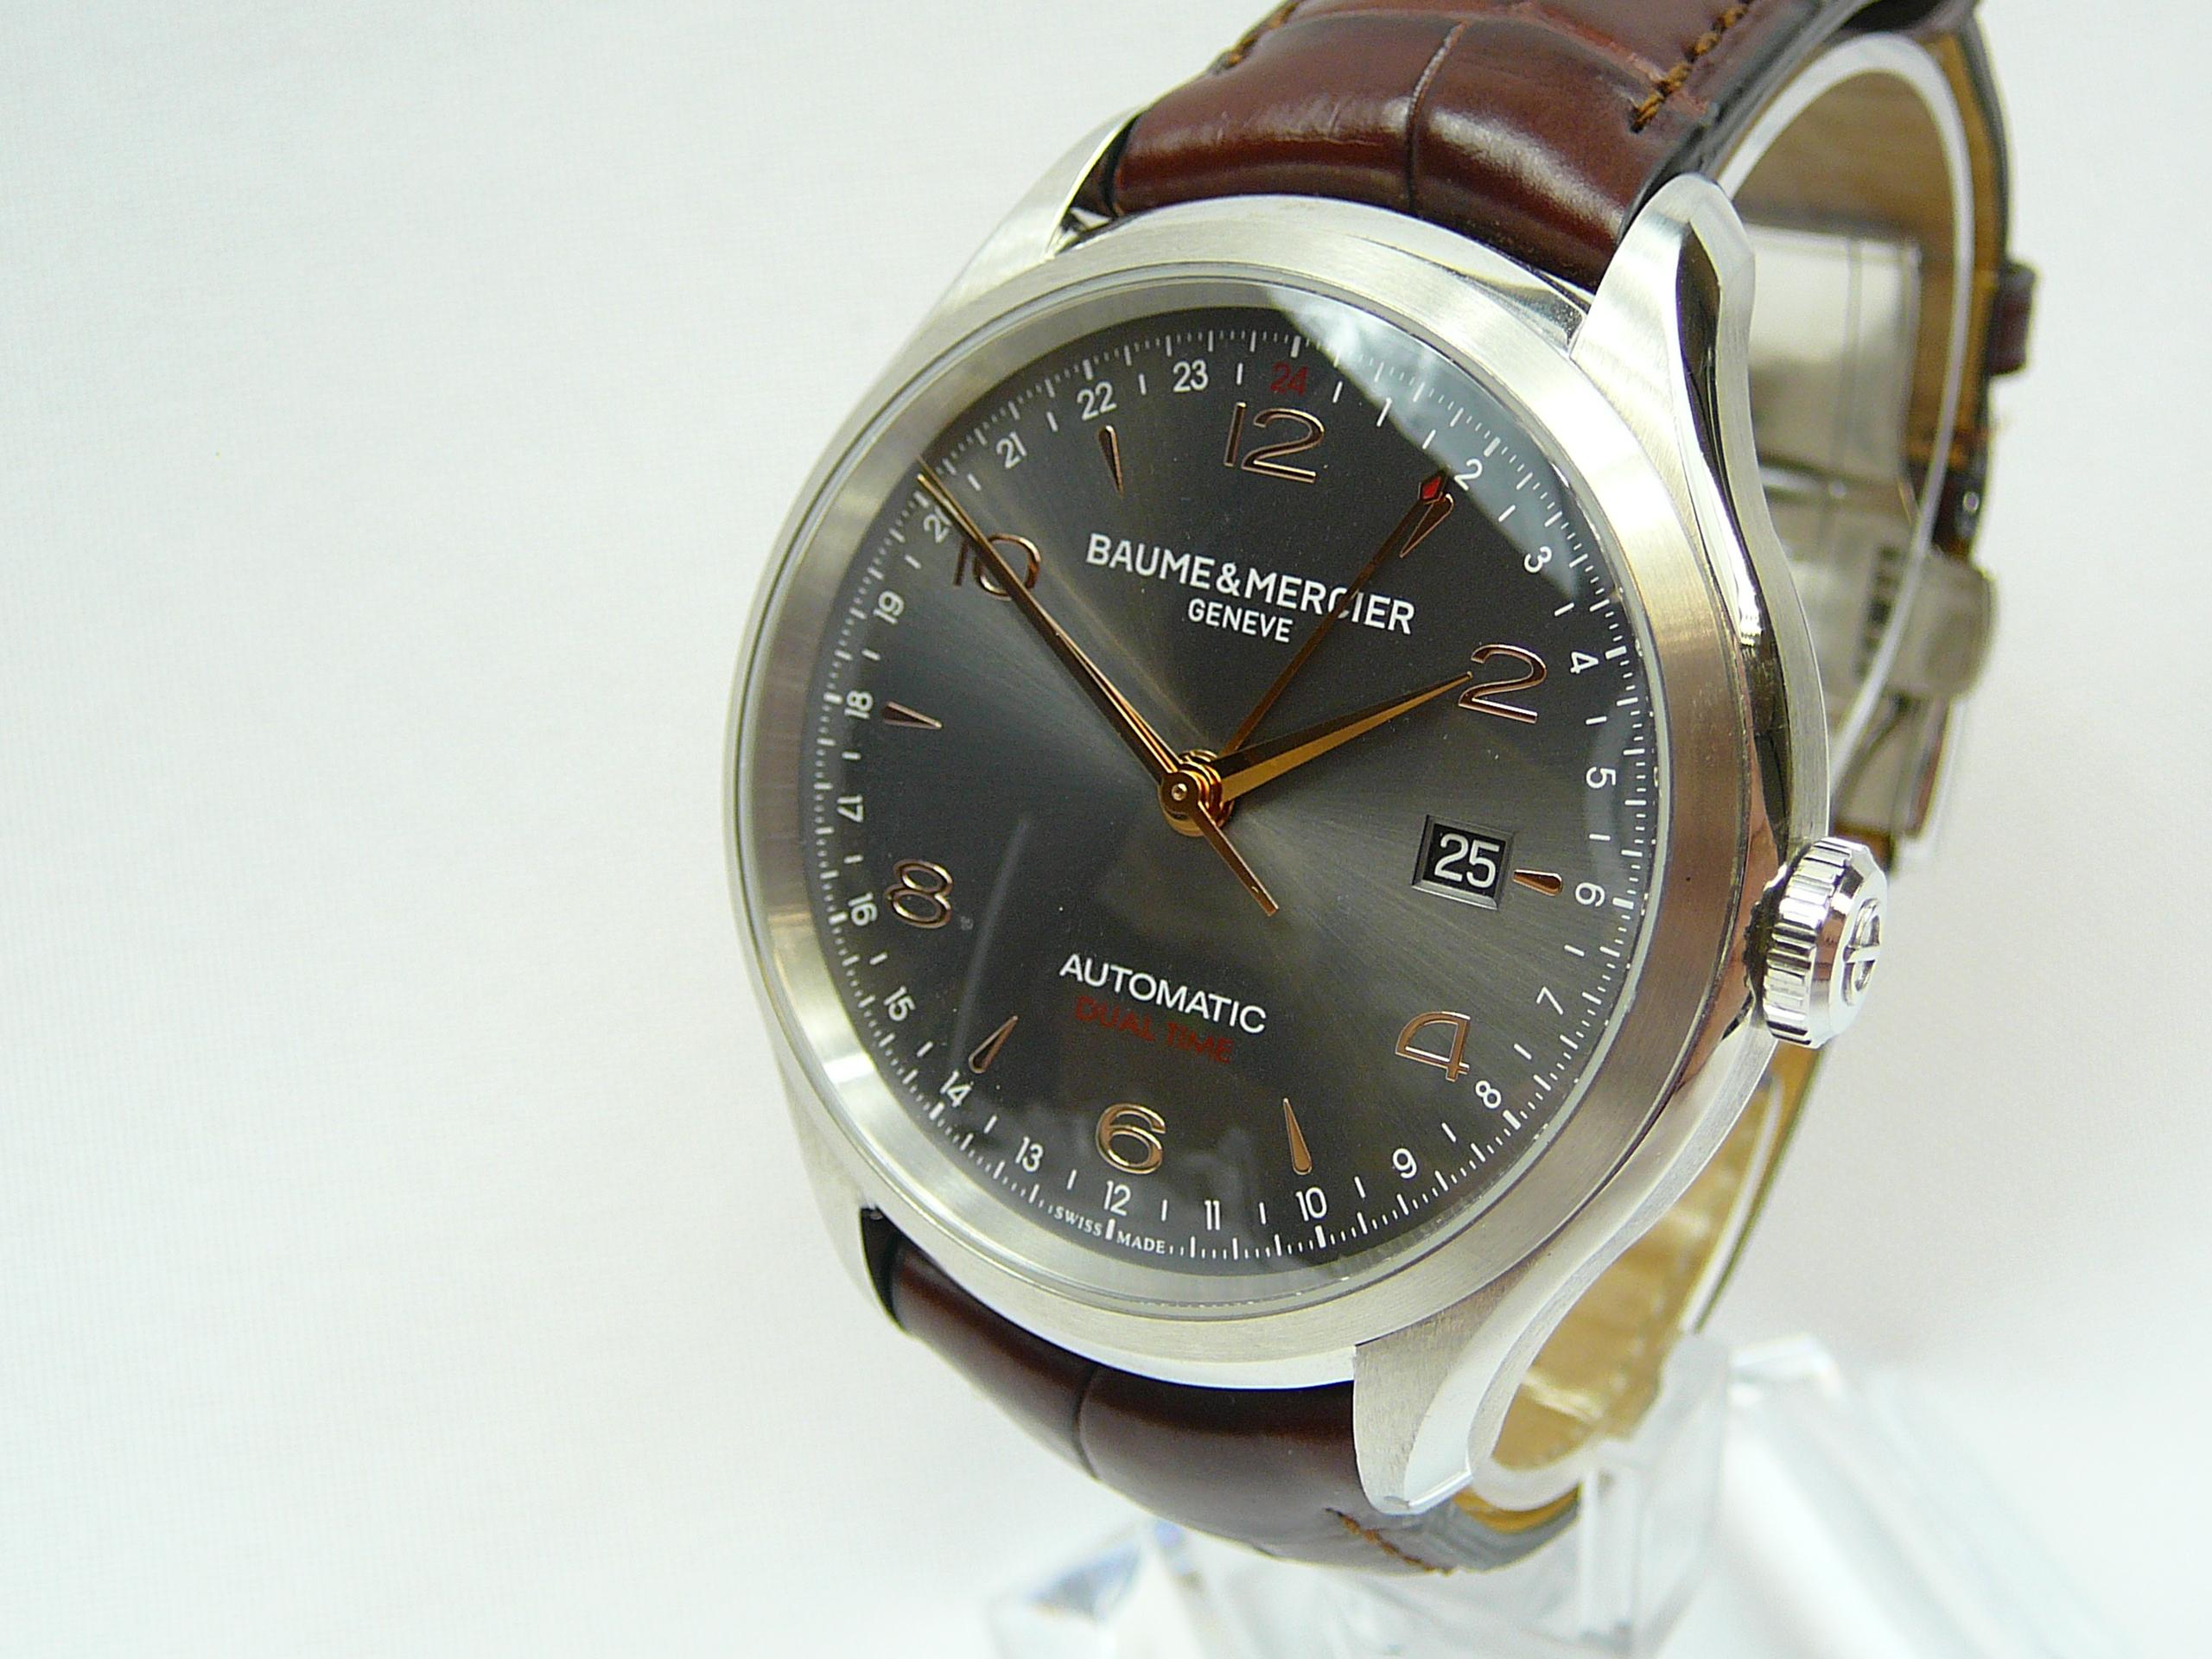 Gents Baume & Mercier Wrist Watch - Image 2 of 4